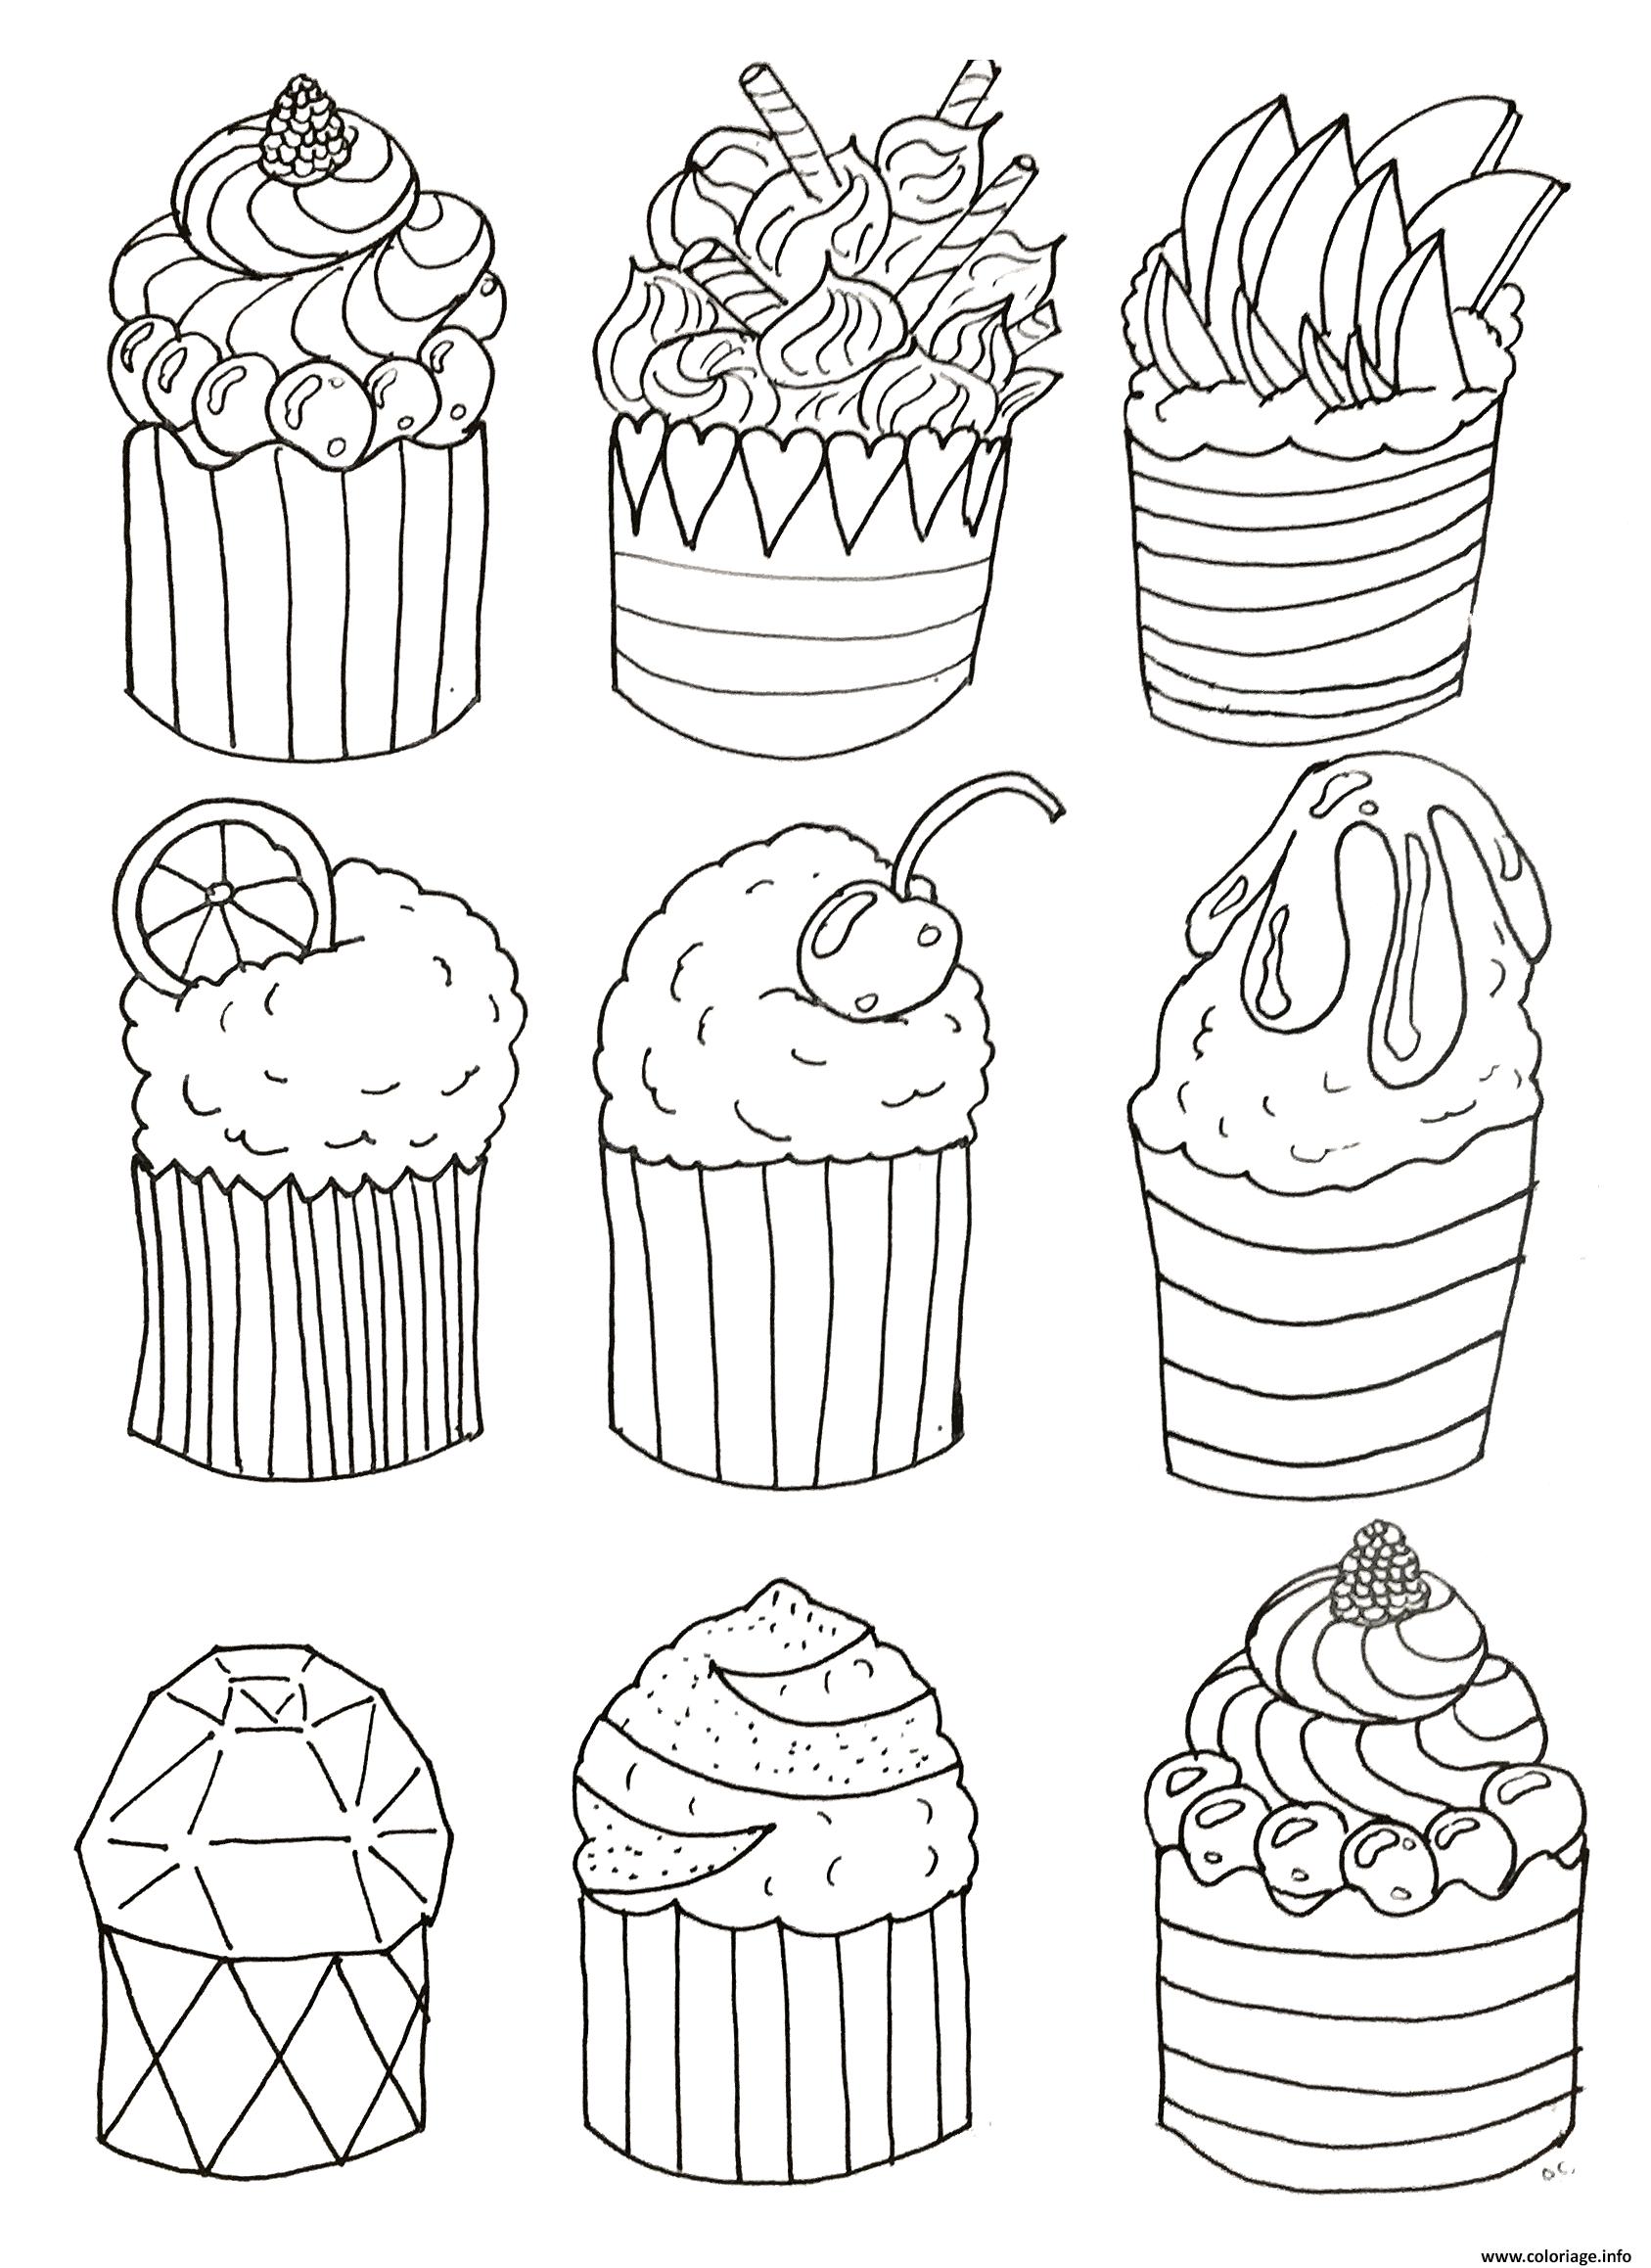 Coloriage simple cup cakes par olivier - Dessin cupcake ...